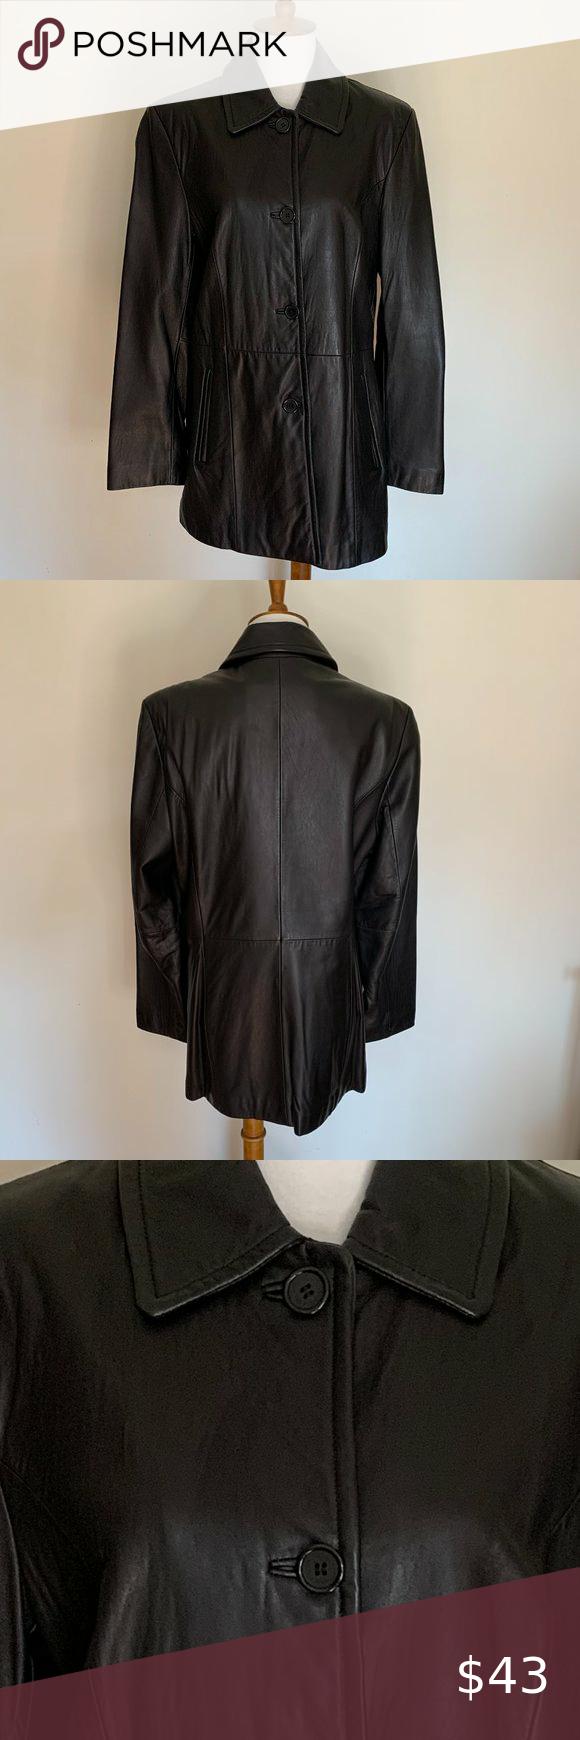 Liz Claiborne Leather Jacket Distressed Leather Jacket North Face Jacket Womens Liz Claiborne